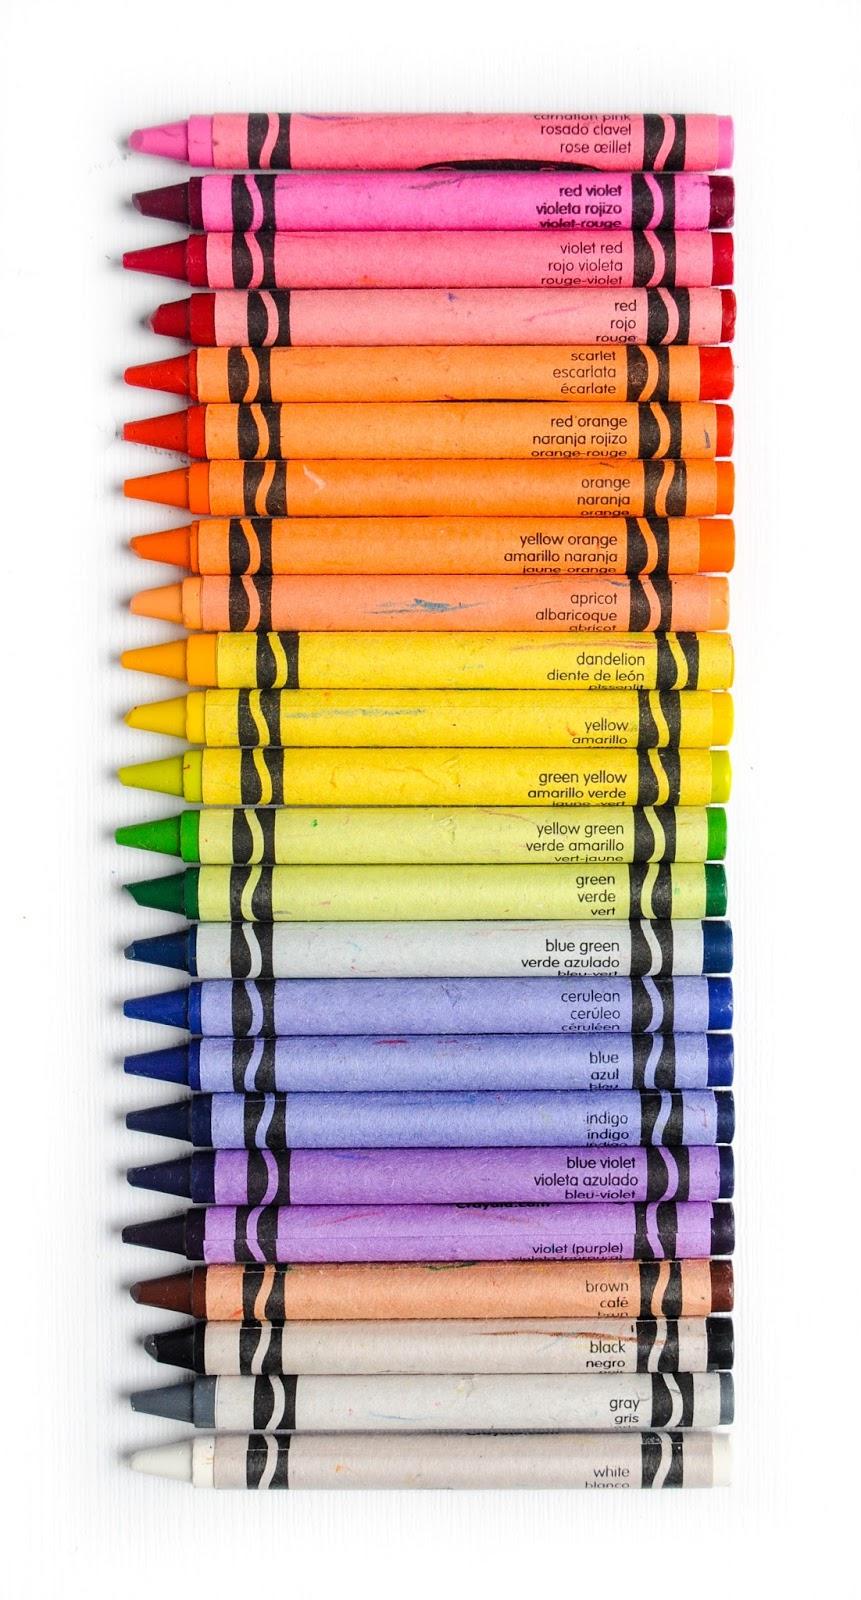 24 Count Crayola Crayons Whats Inside the Box Jennys Crayon